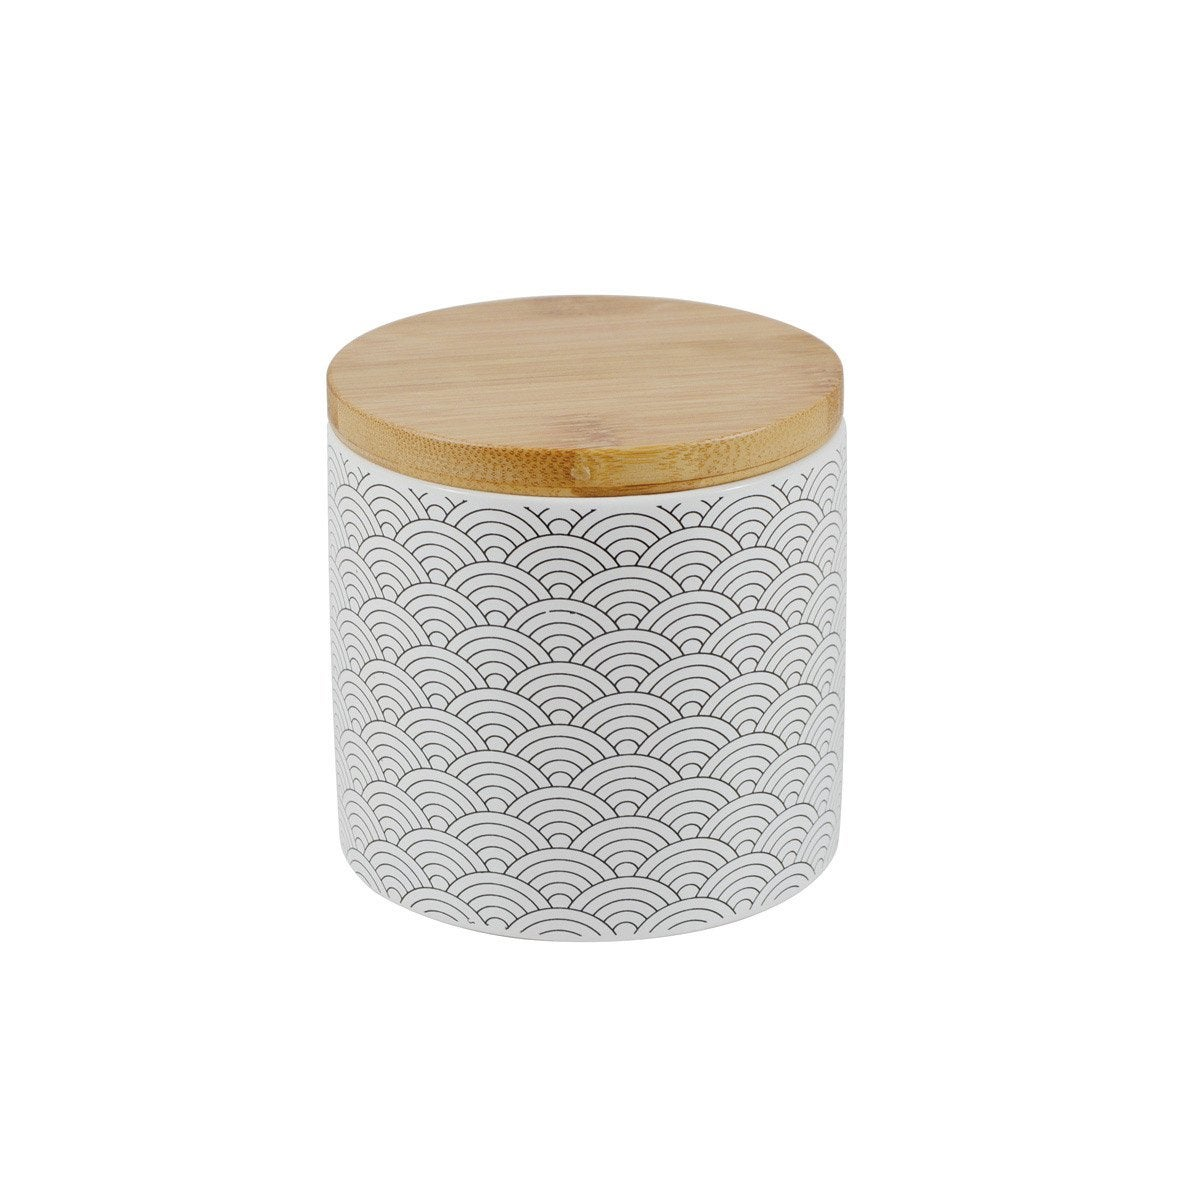 Boîte céramique Okino, noir et blanc